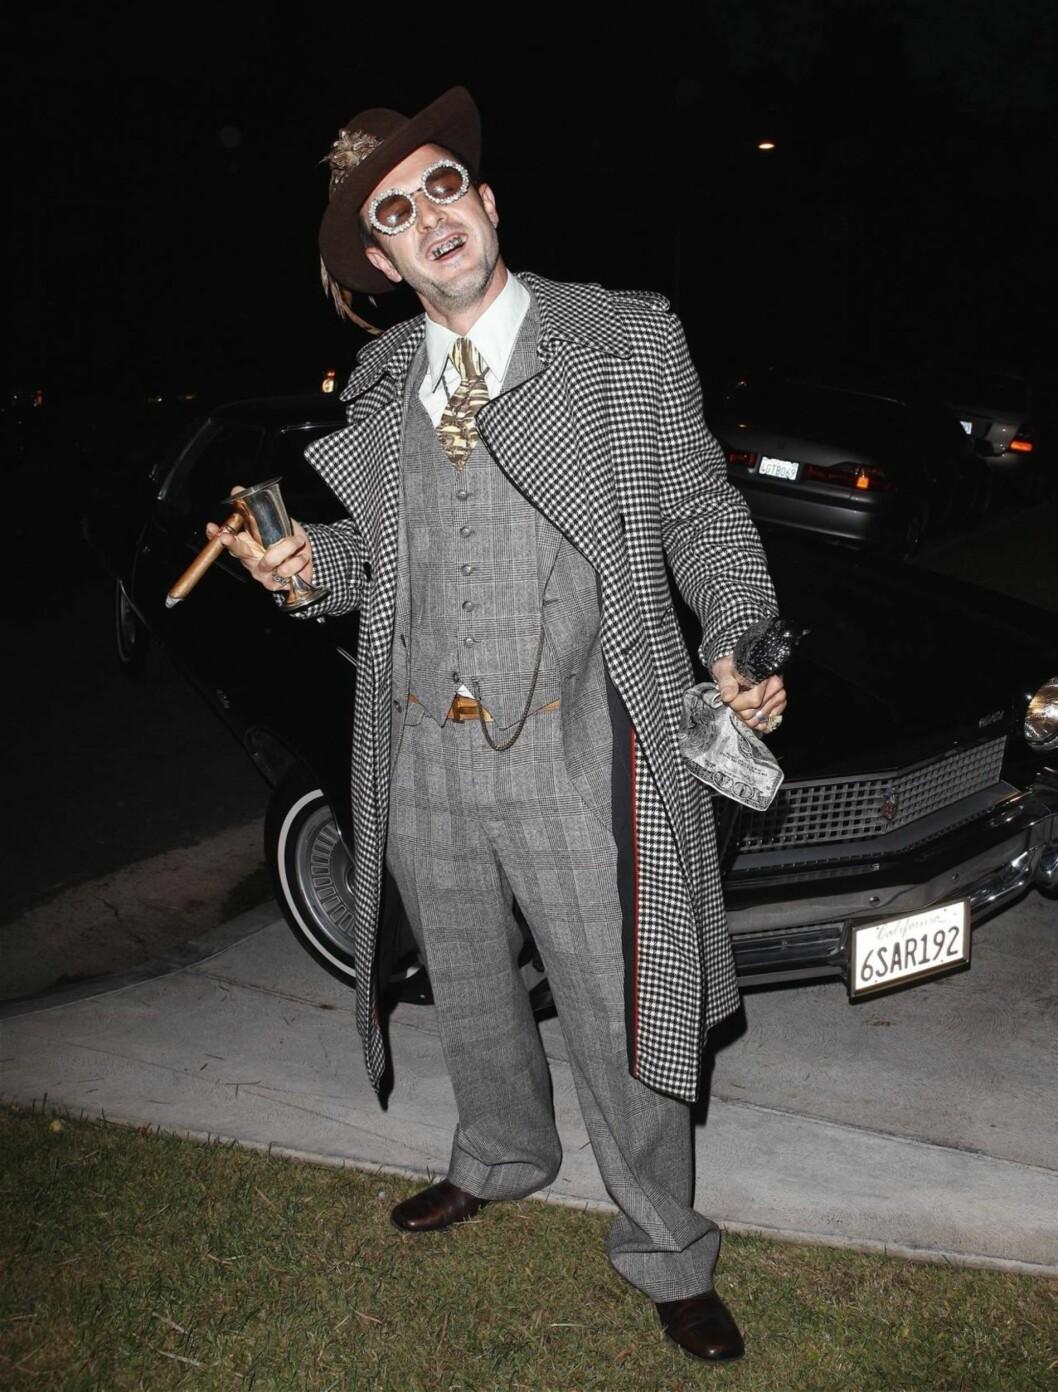 ... og som pimp på privat halloweenfest i Beverly Hills dagen etter. Foto: All Over Press